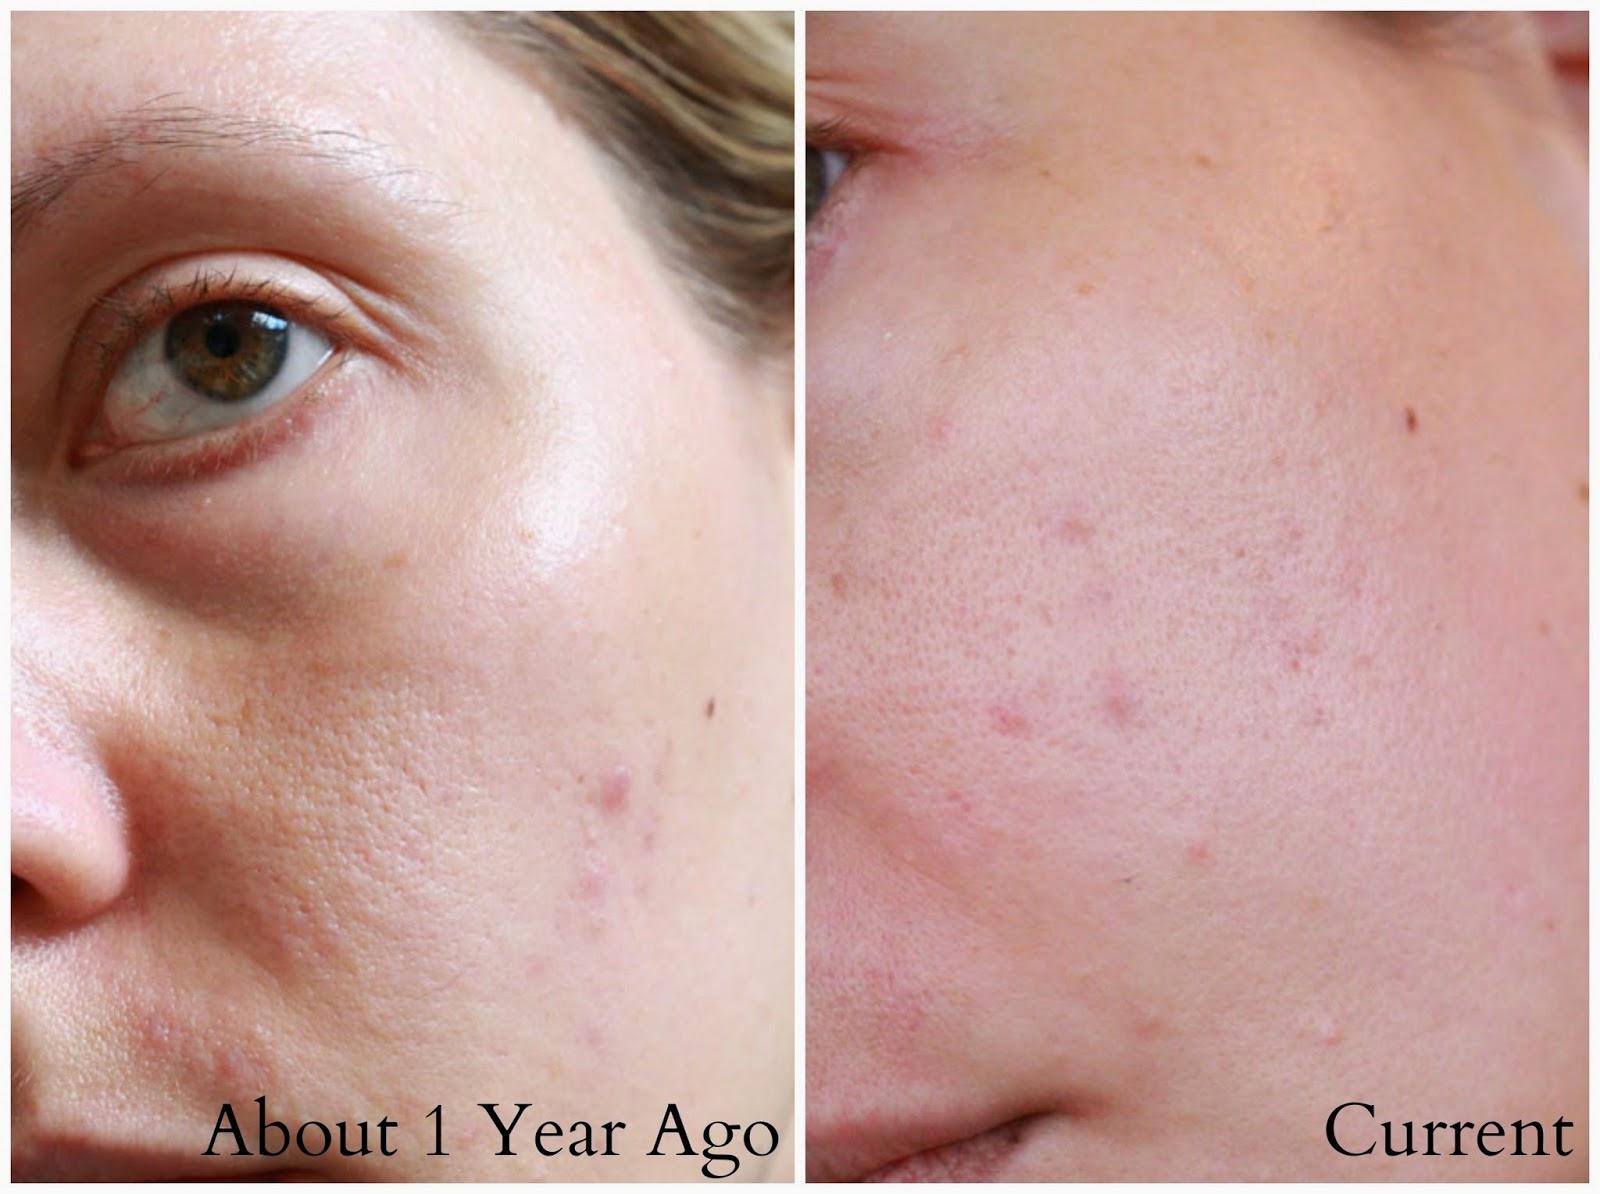 Lip & Body Treatment Balm by Paula's Choice #15